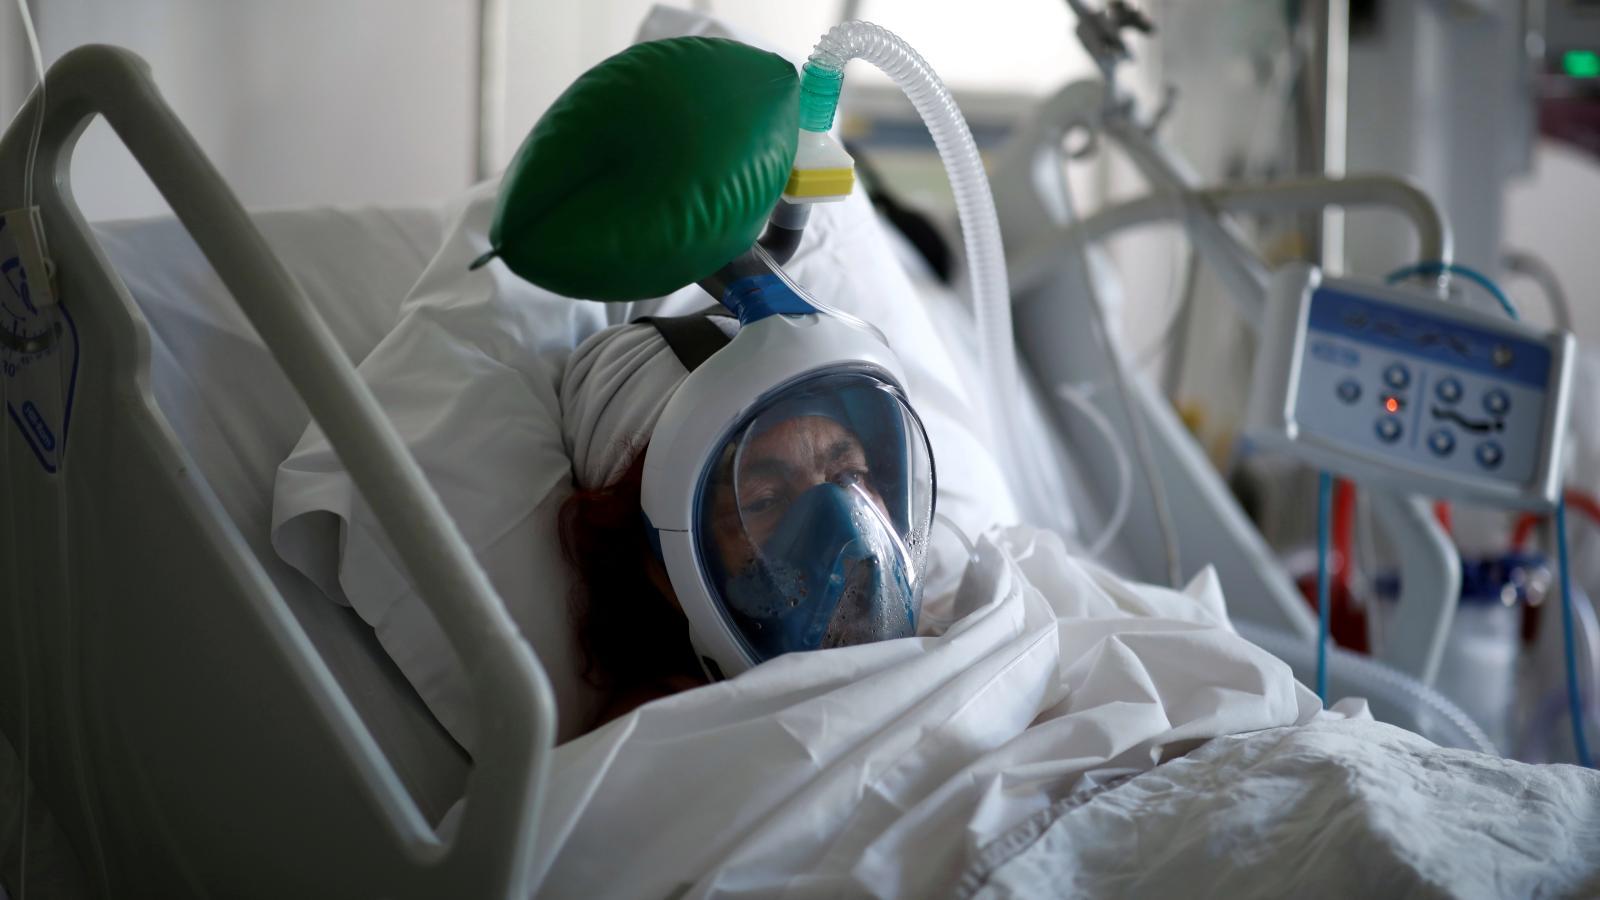 250 Ventilators Bought From China 'Could Kill Coronavirus Patients If Used' - Britiish Doctors Raise Alarm